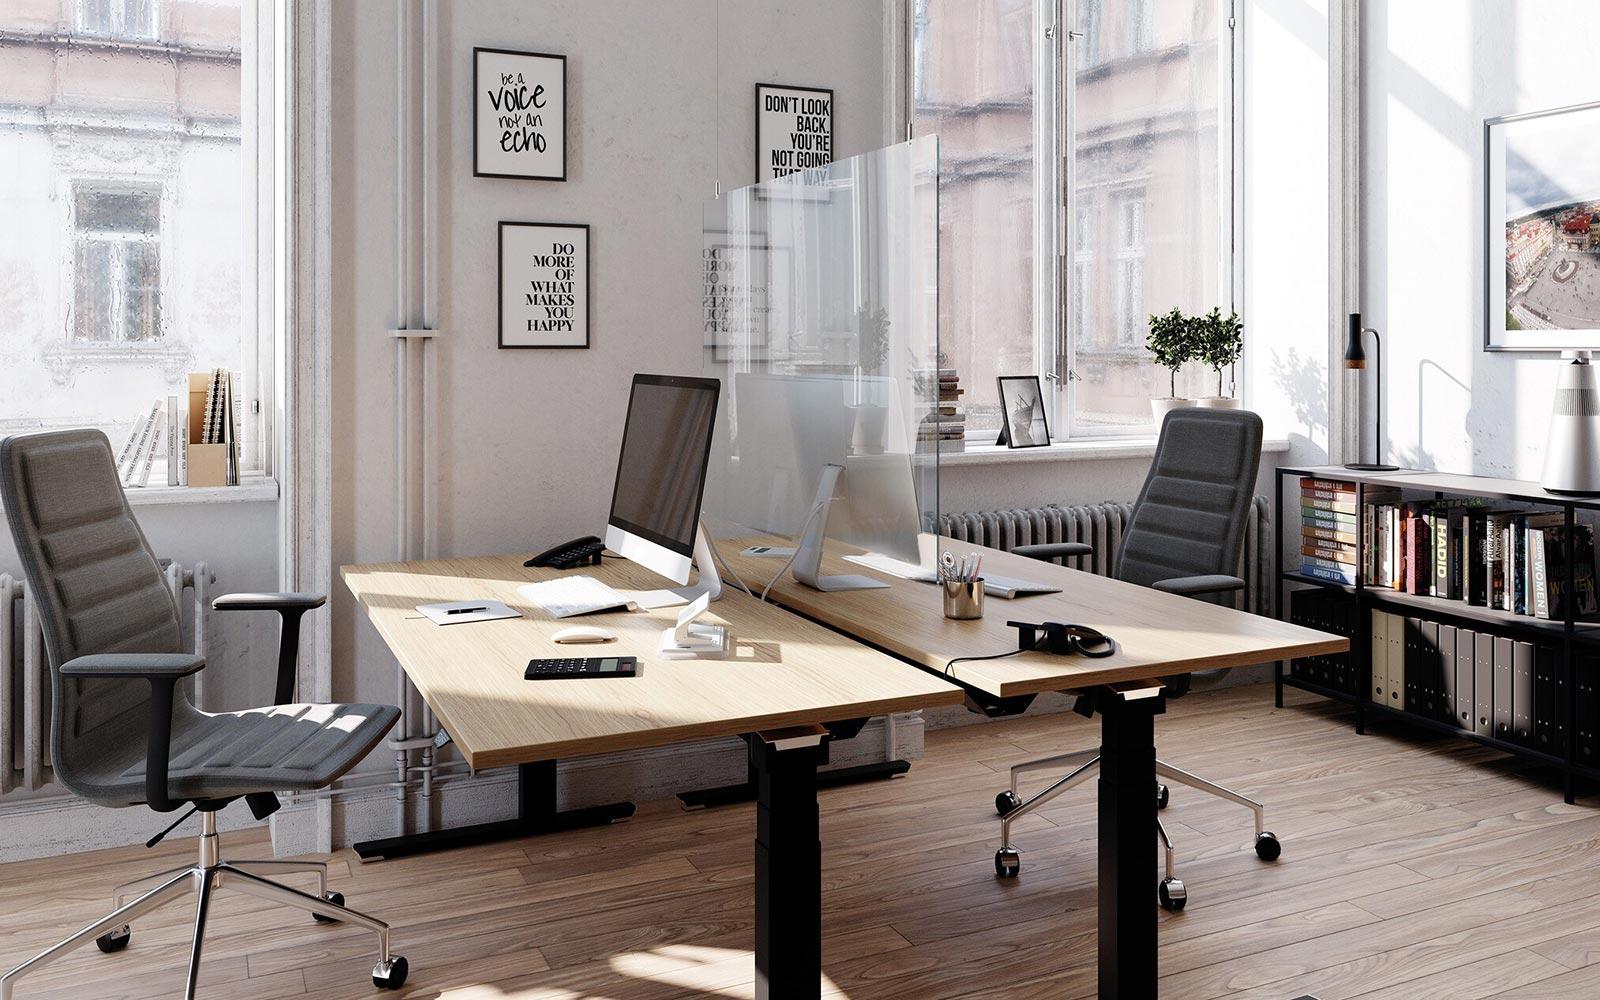 Trennwand zweier Büroarbeitsplätze